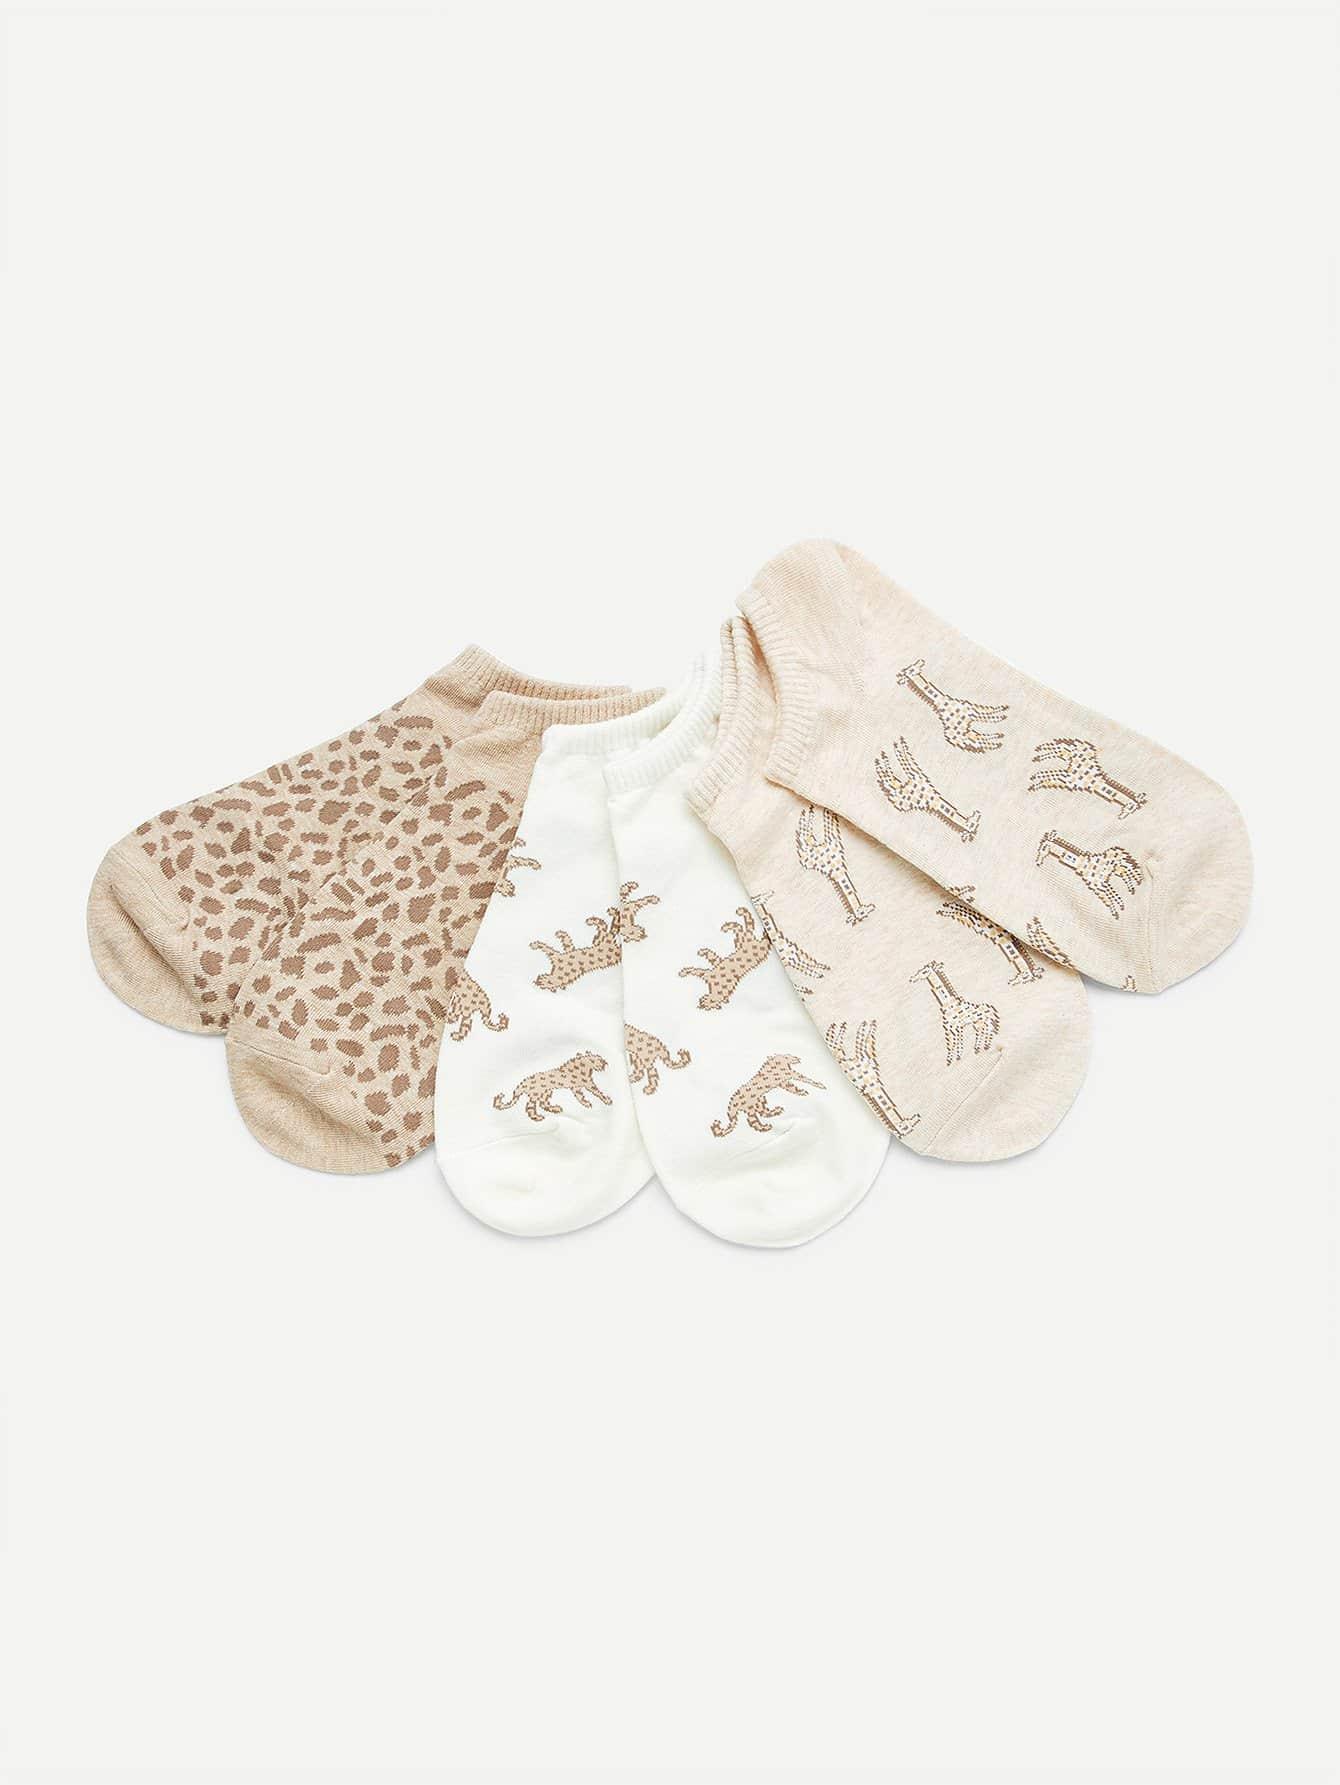 Animal Print Invisible Socks 3pairs animal embroidery invisible socks 3pairs